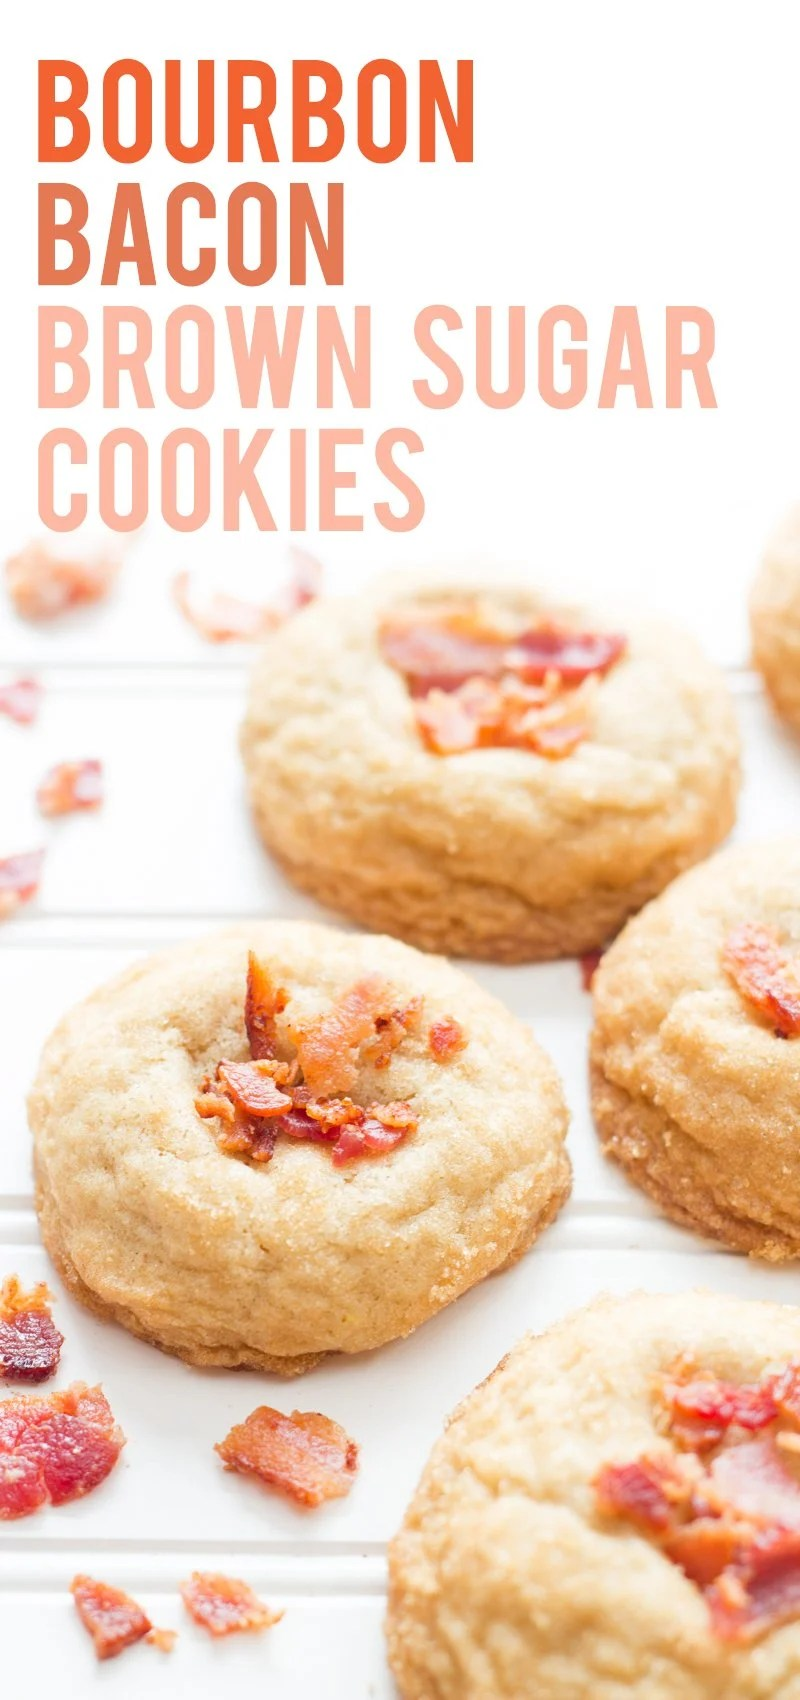 Bourbon Bacon Brown Sugar Cookies